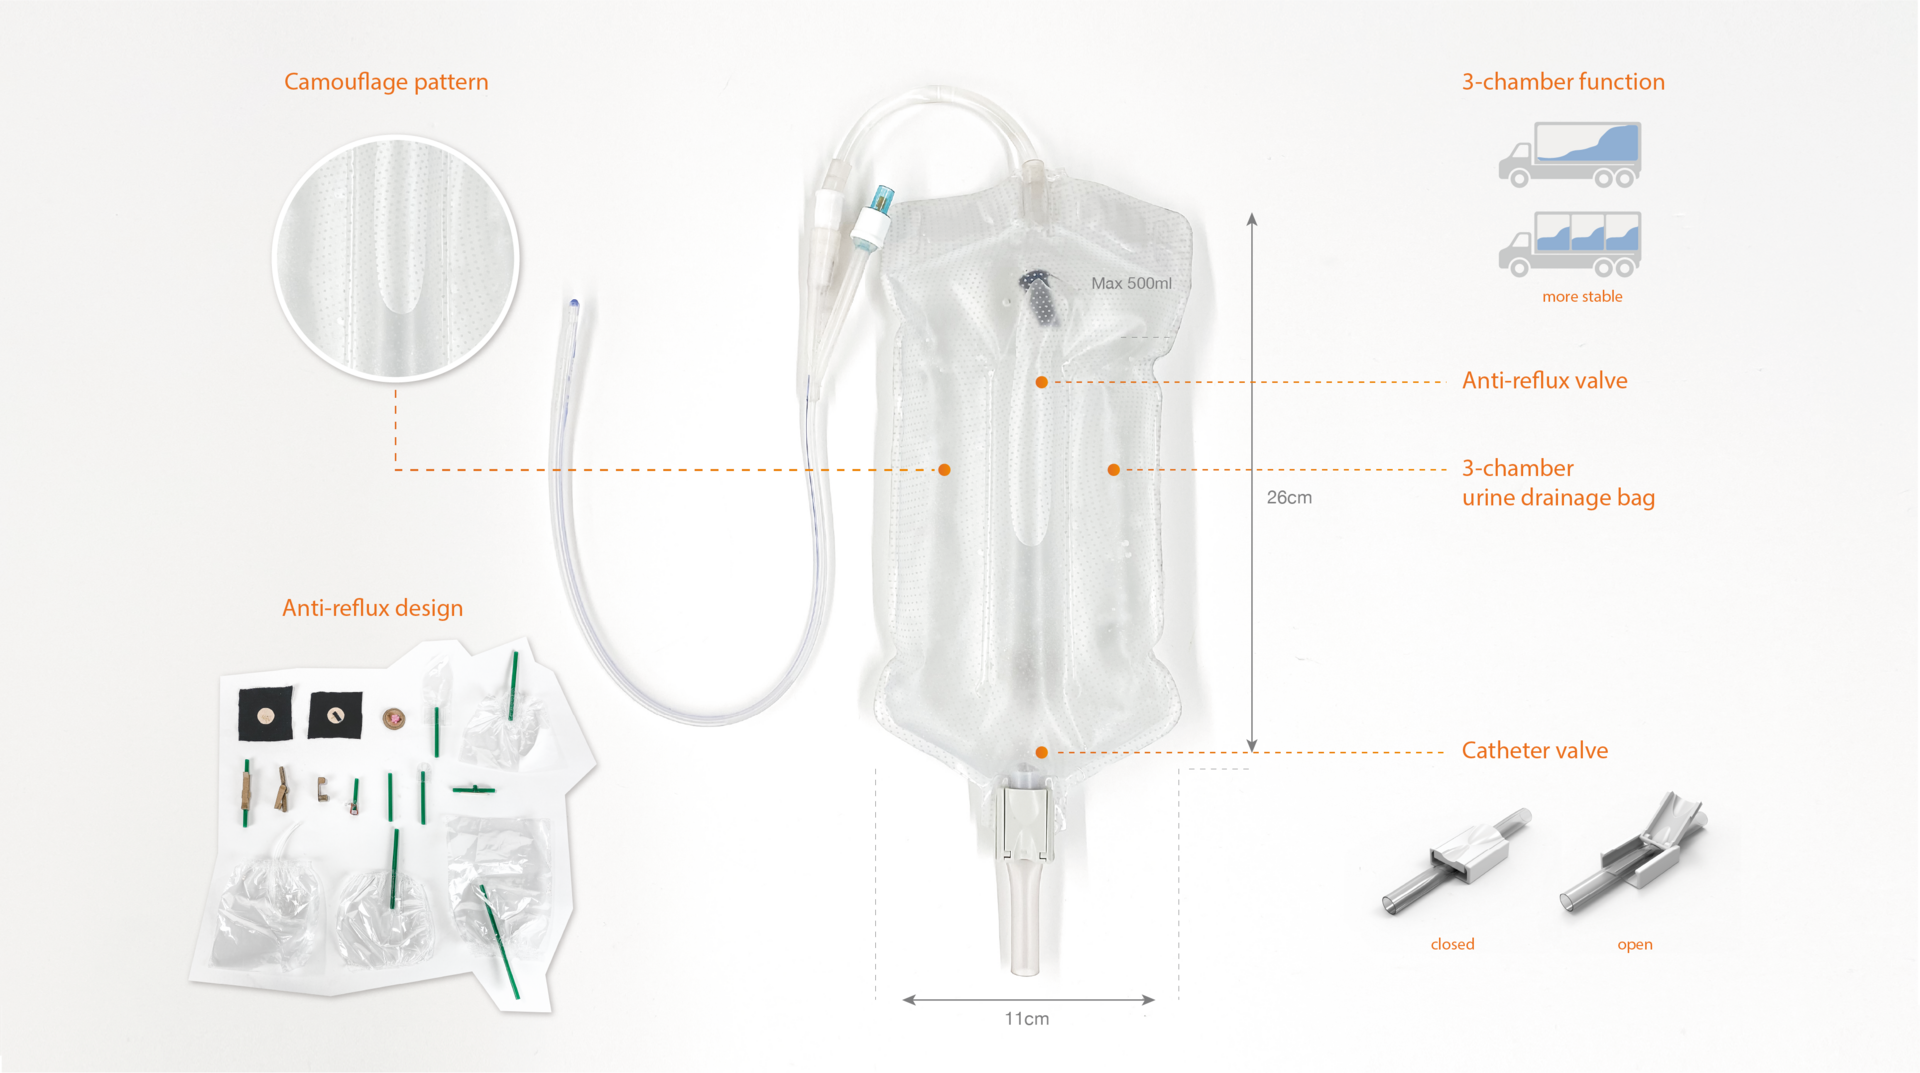 UCAN_Redesign Urine Drainage Bag